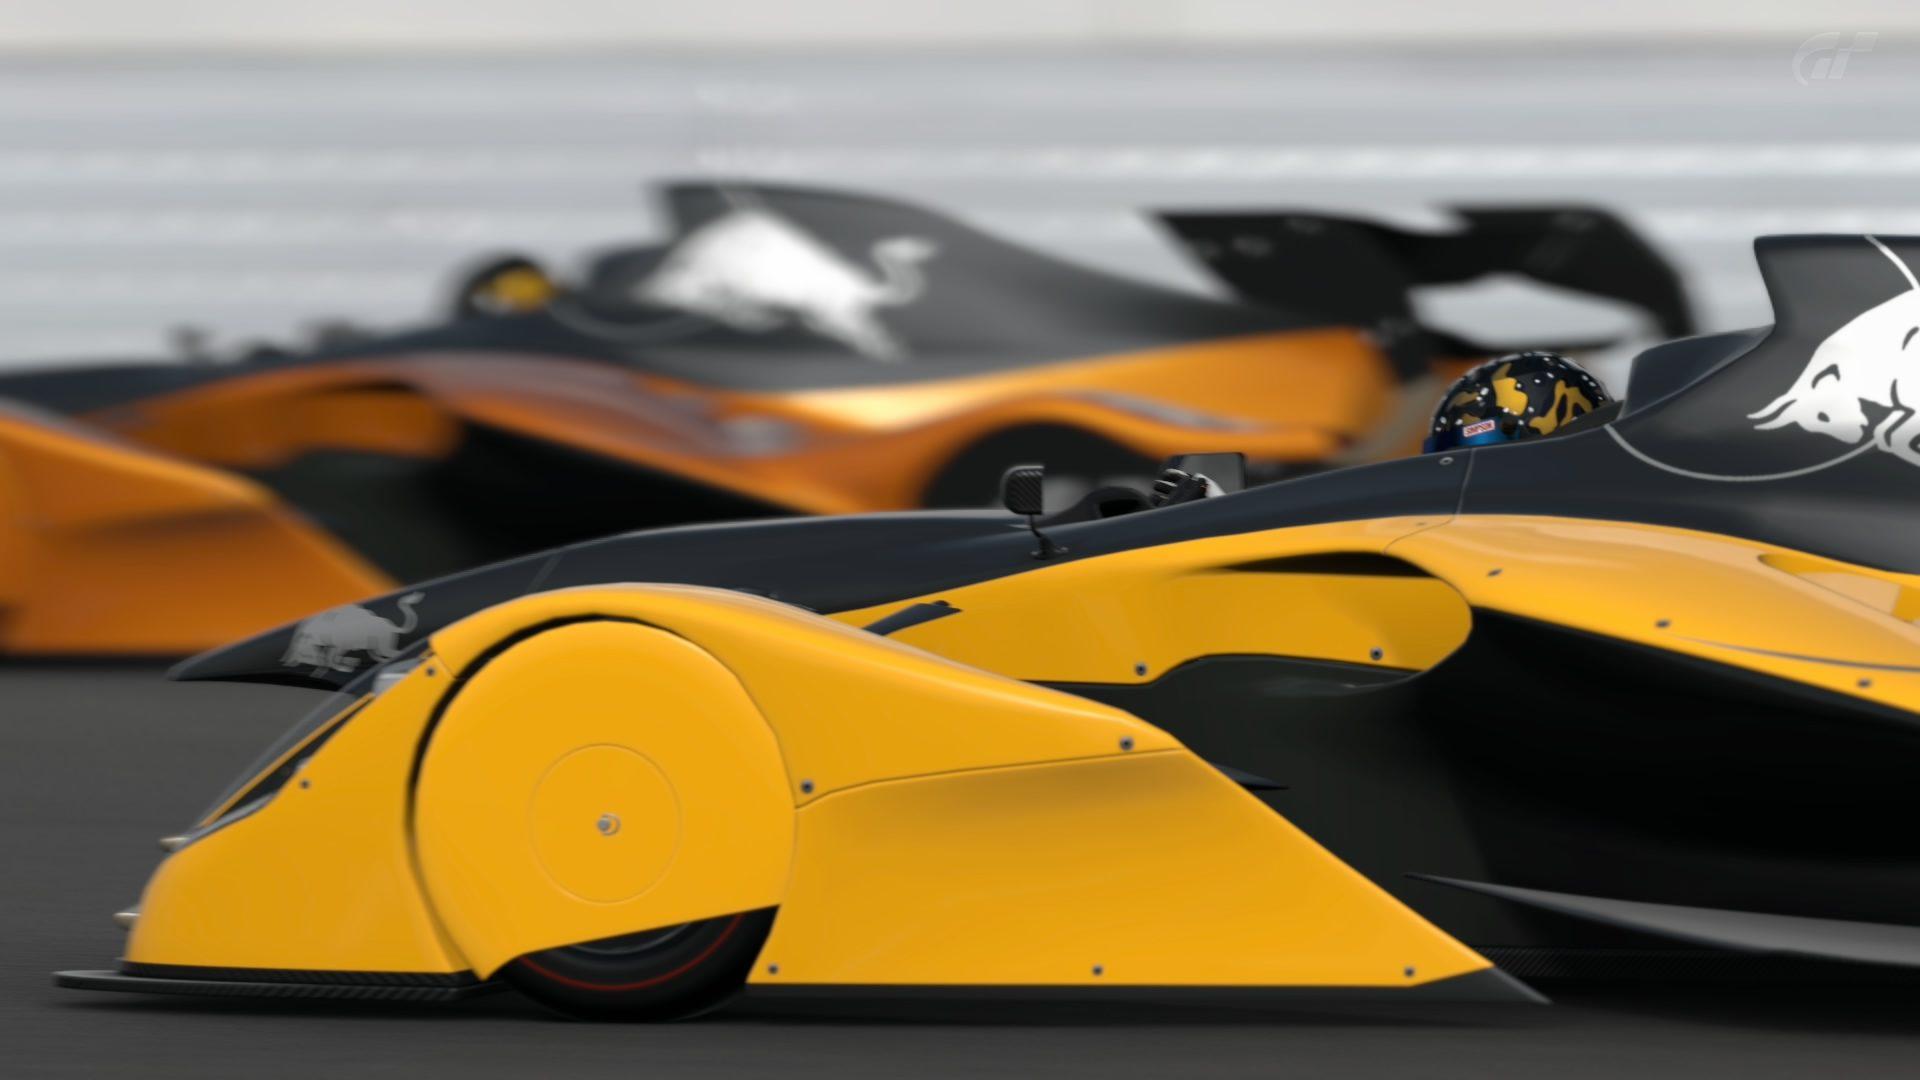 Twin Ring Motegi Super Speedway_10.jpg